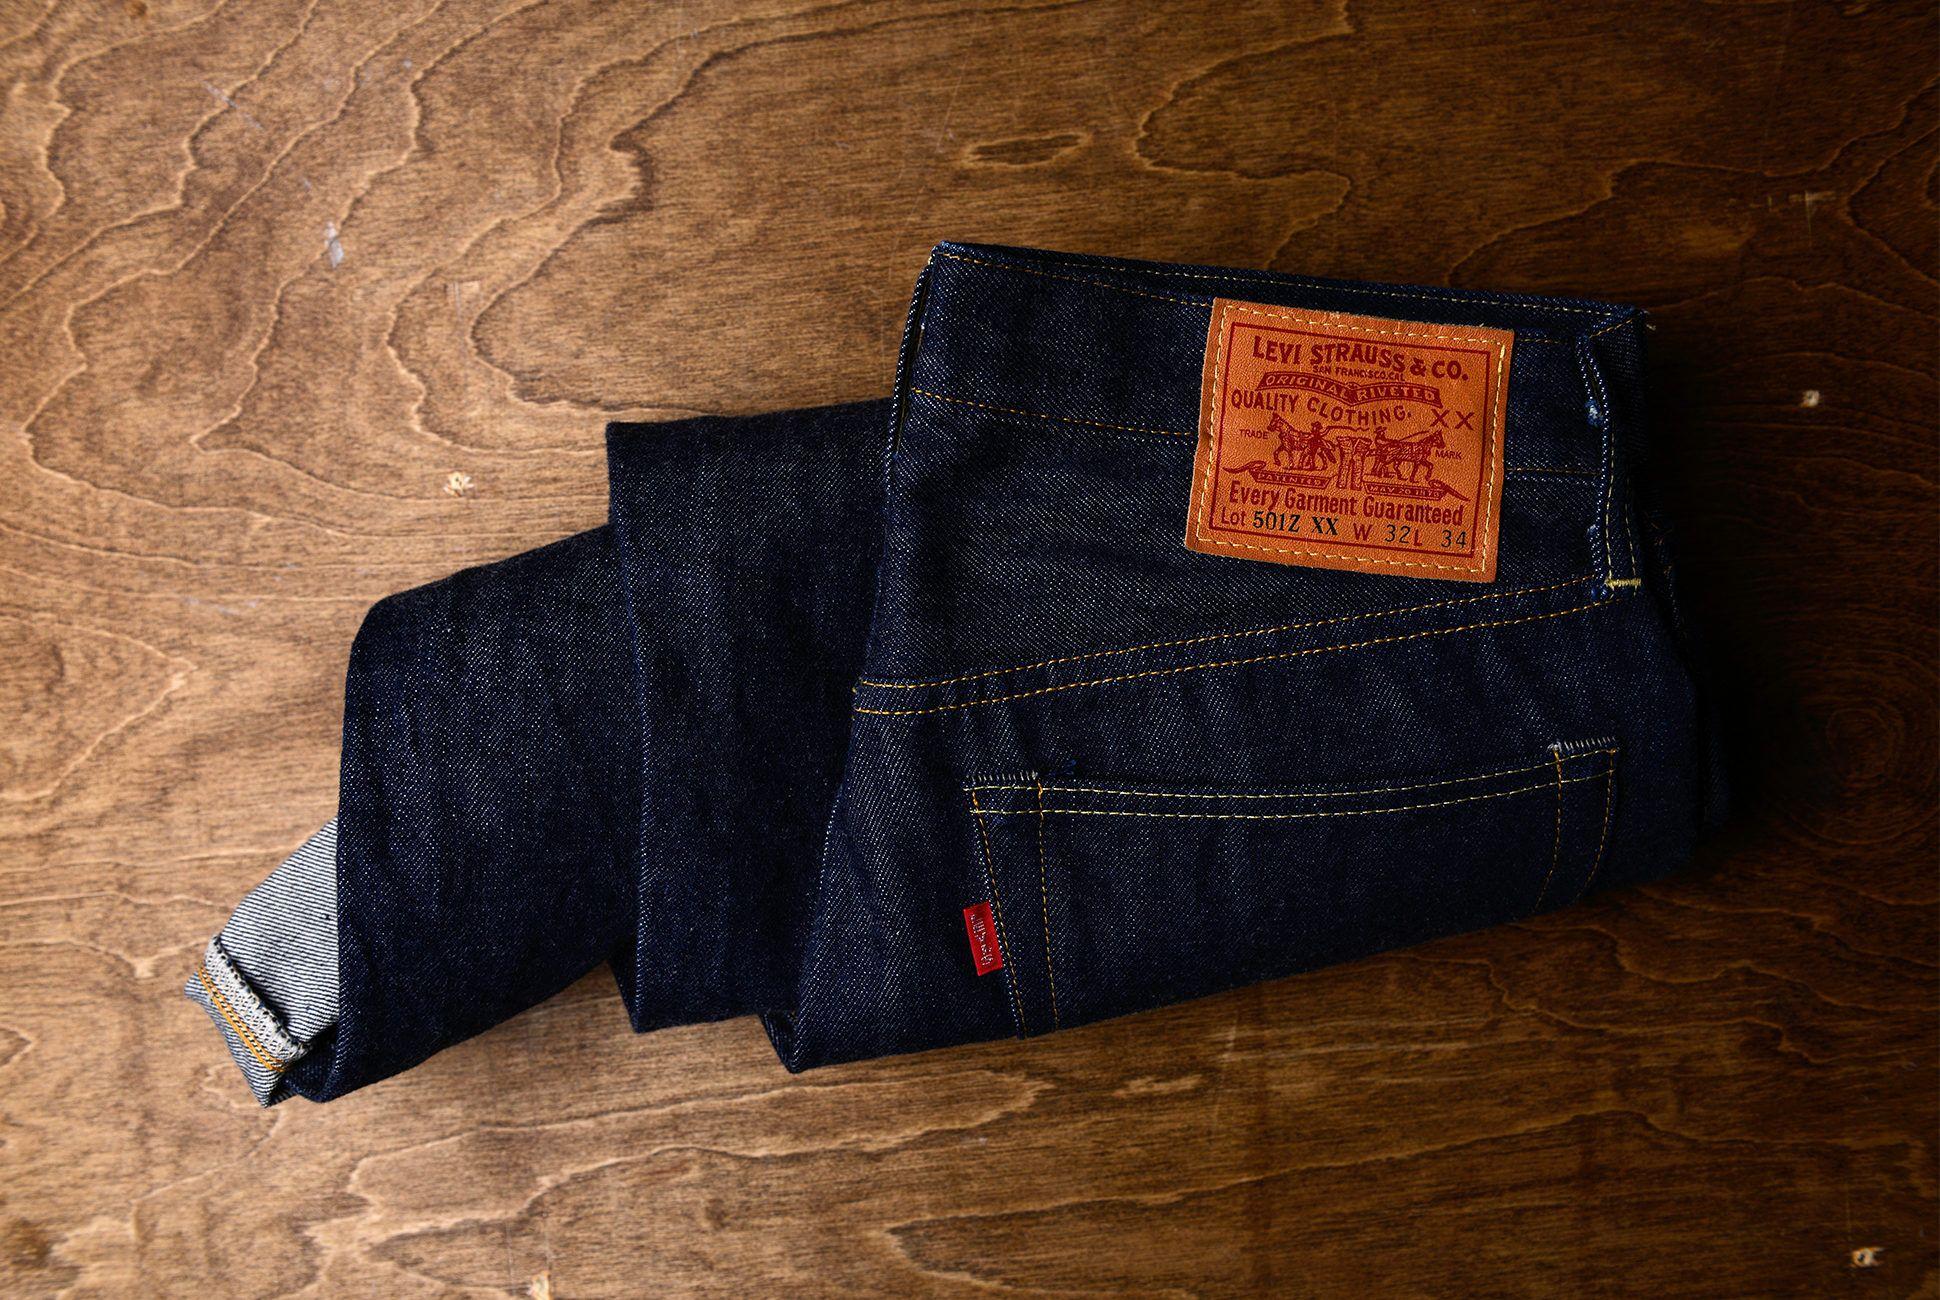 quality-jeans-gear-patrol-970-1